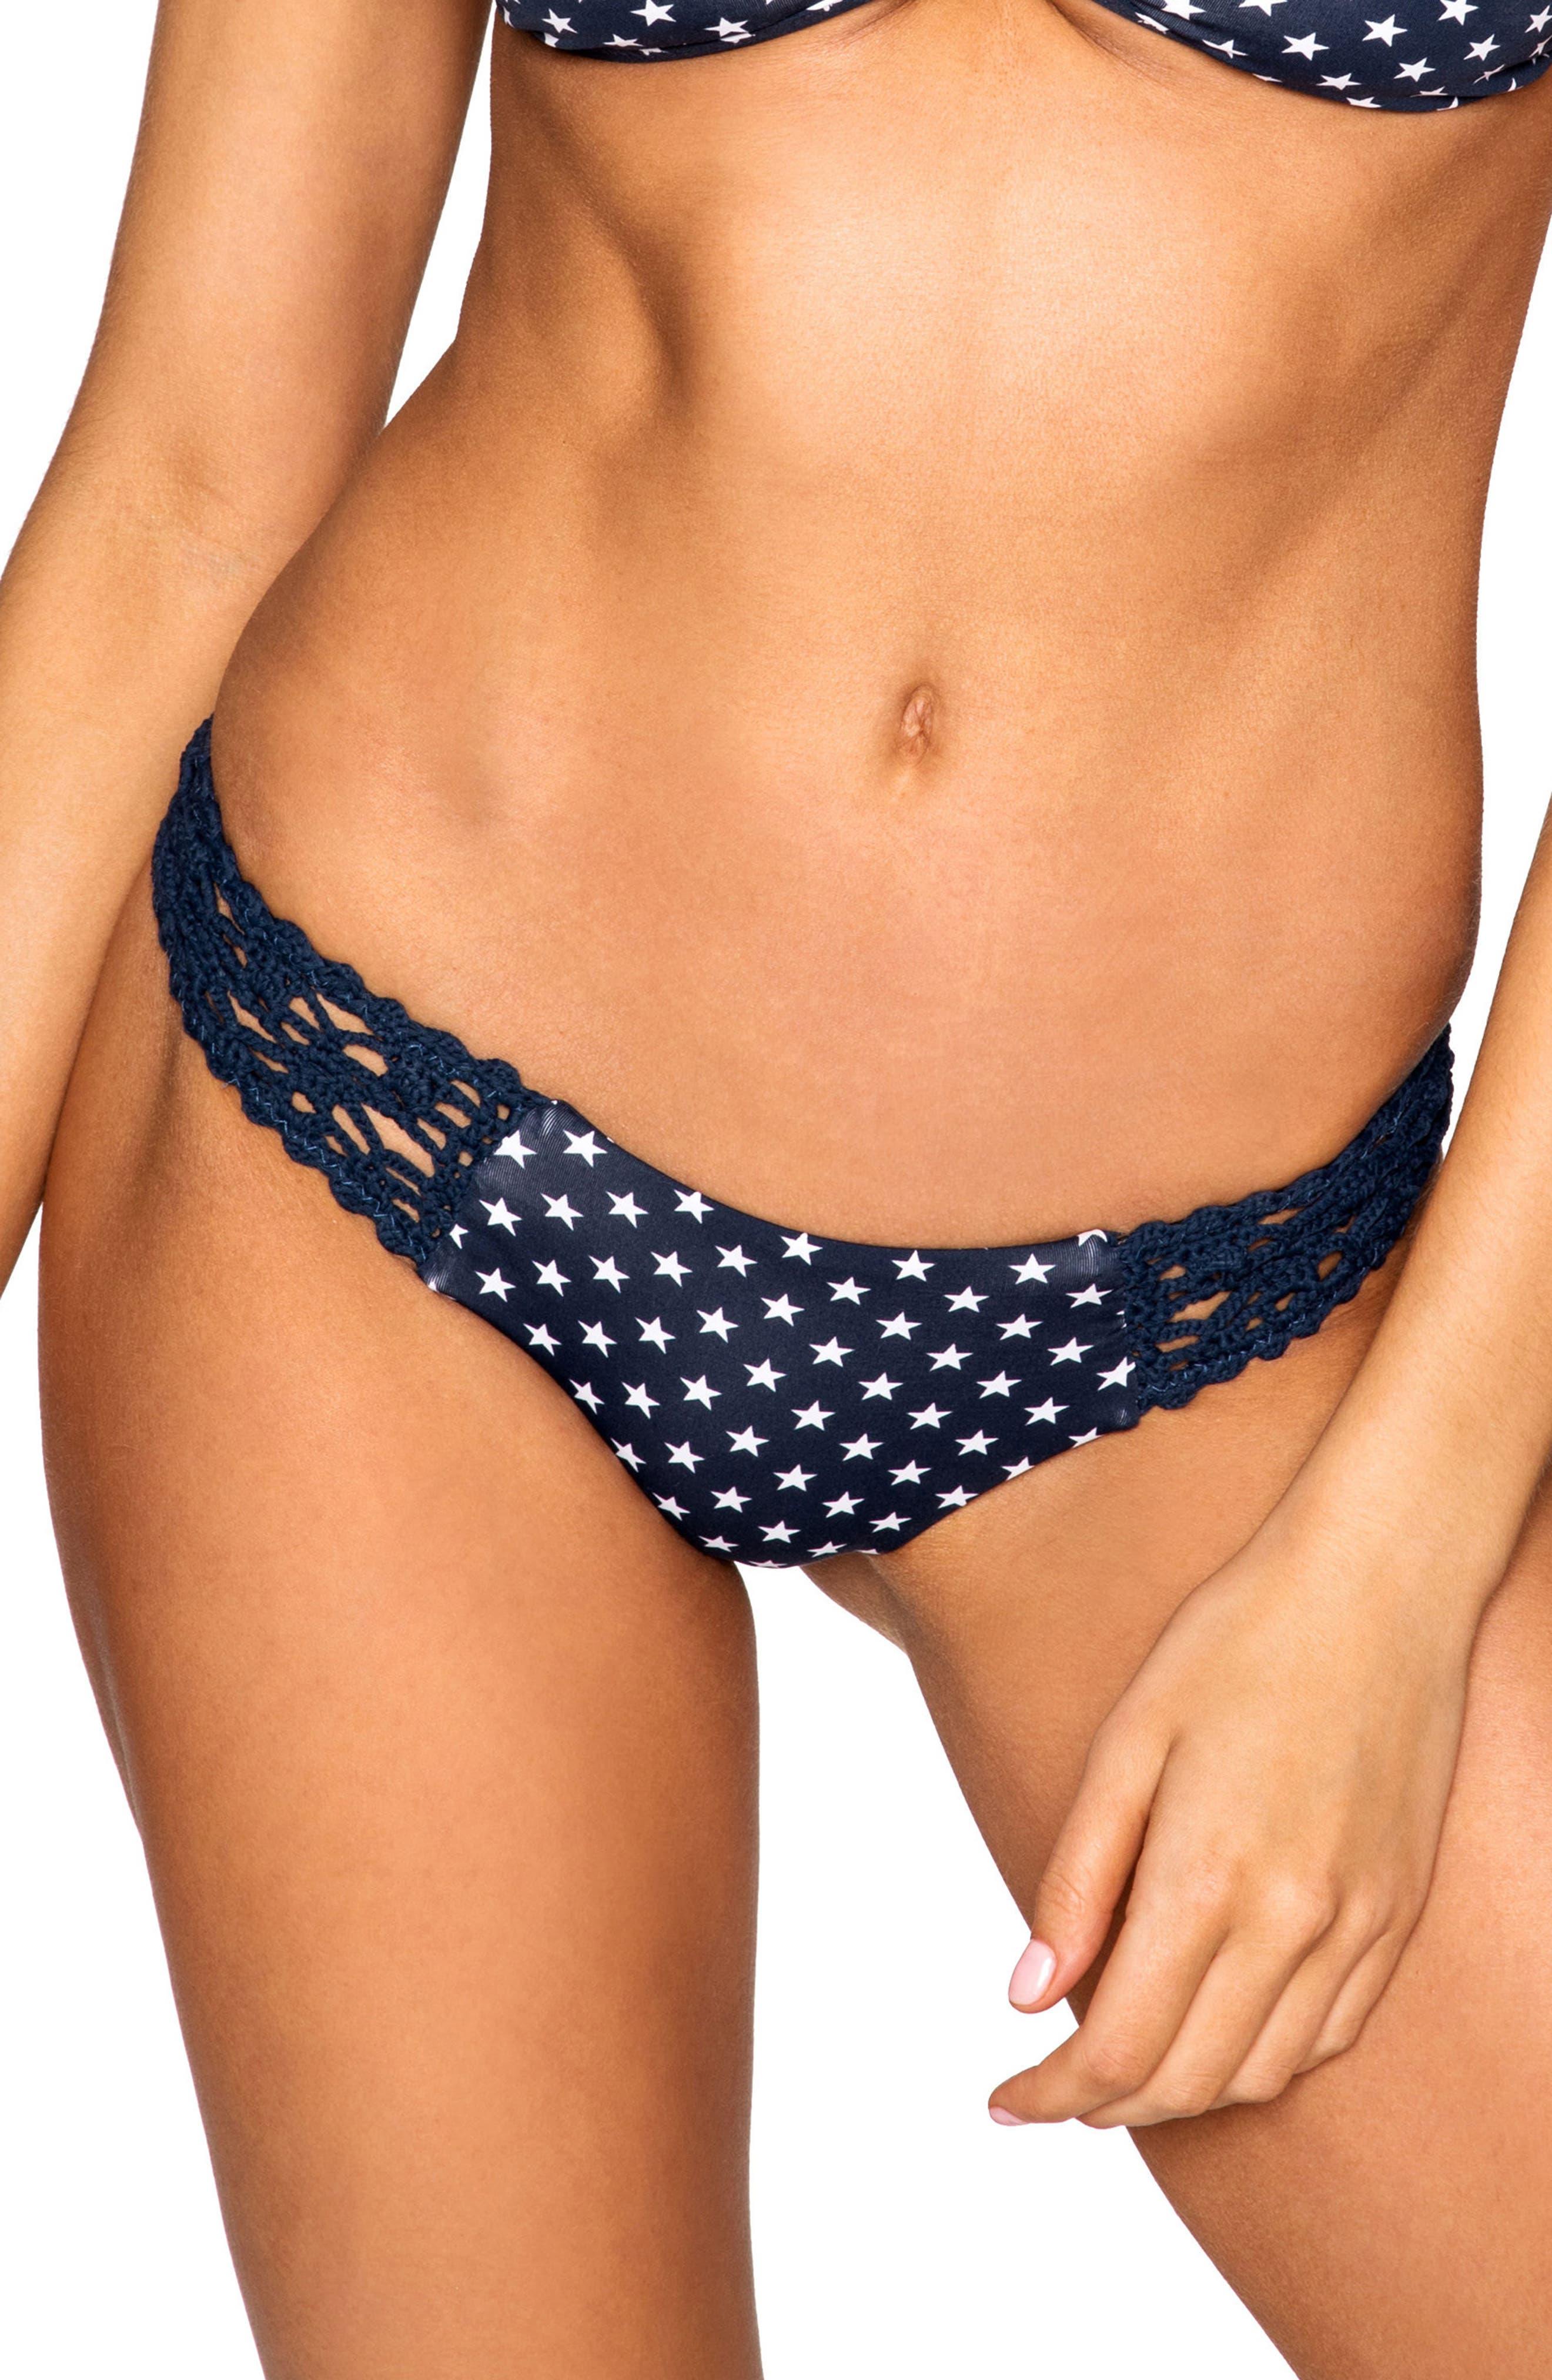 Tanner Bikini Bottoms,                             Main thumbnail 1, color,                             410